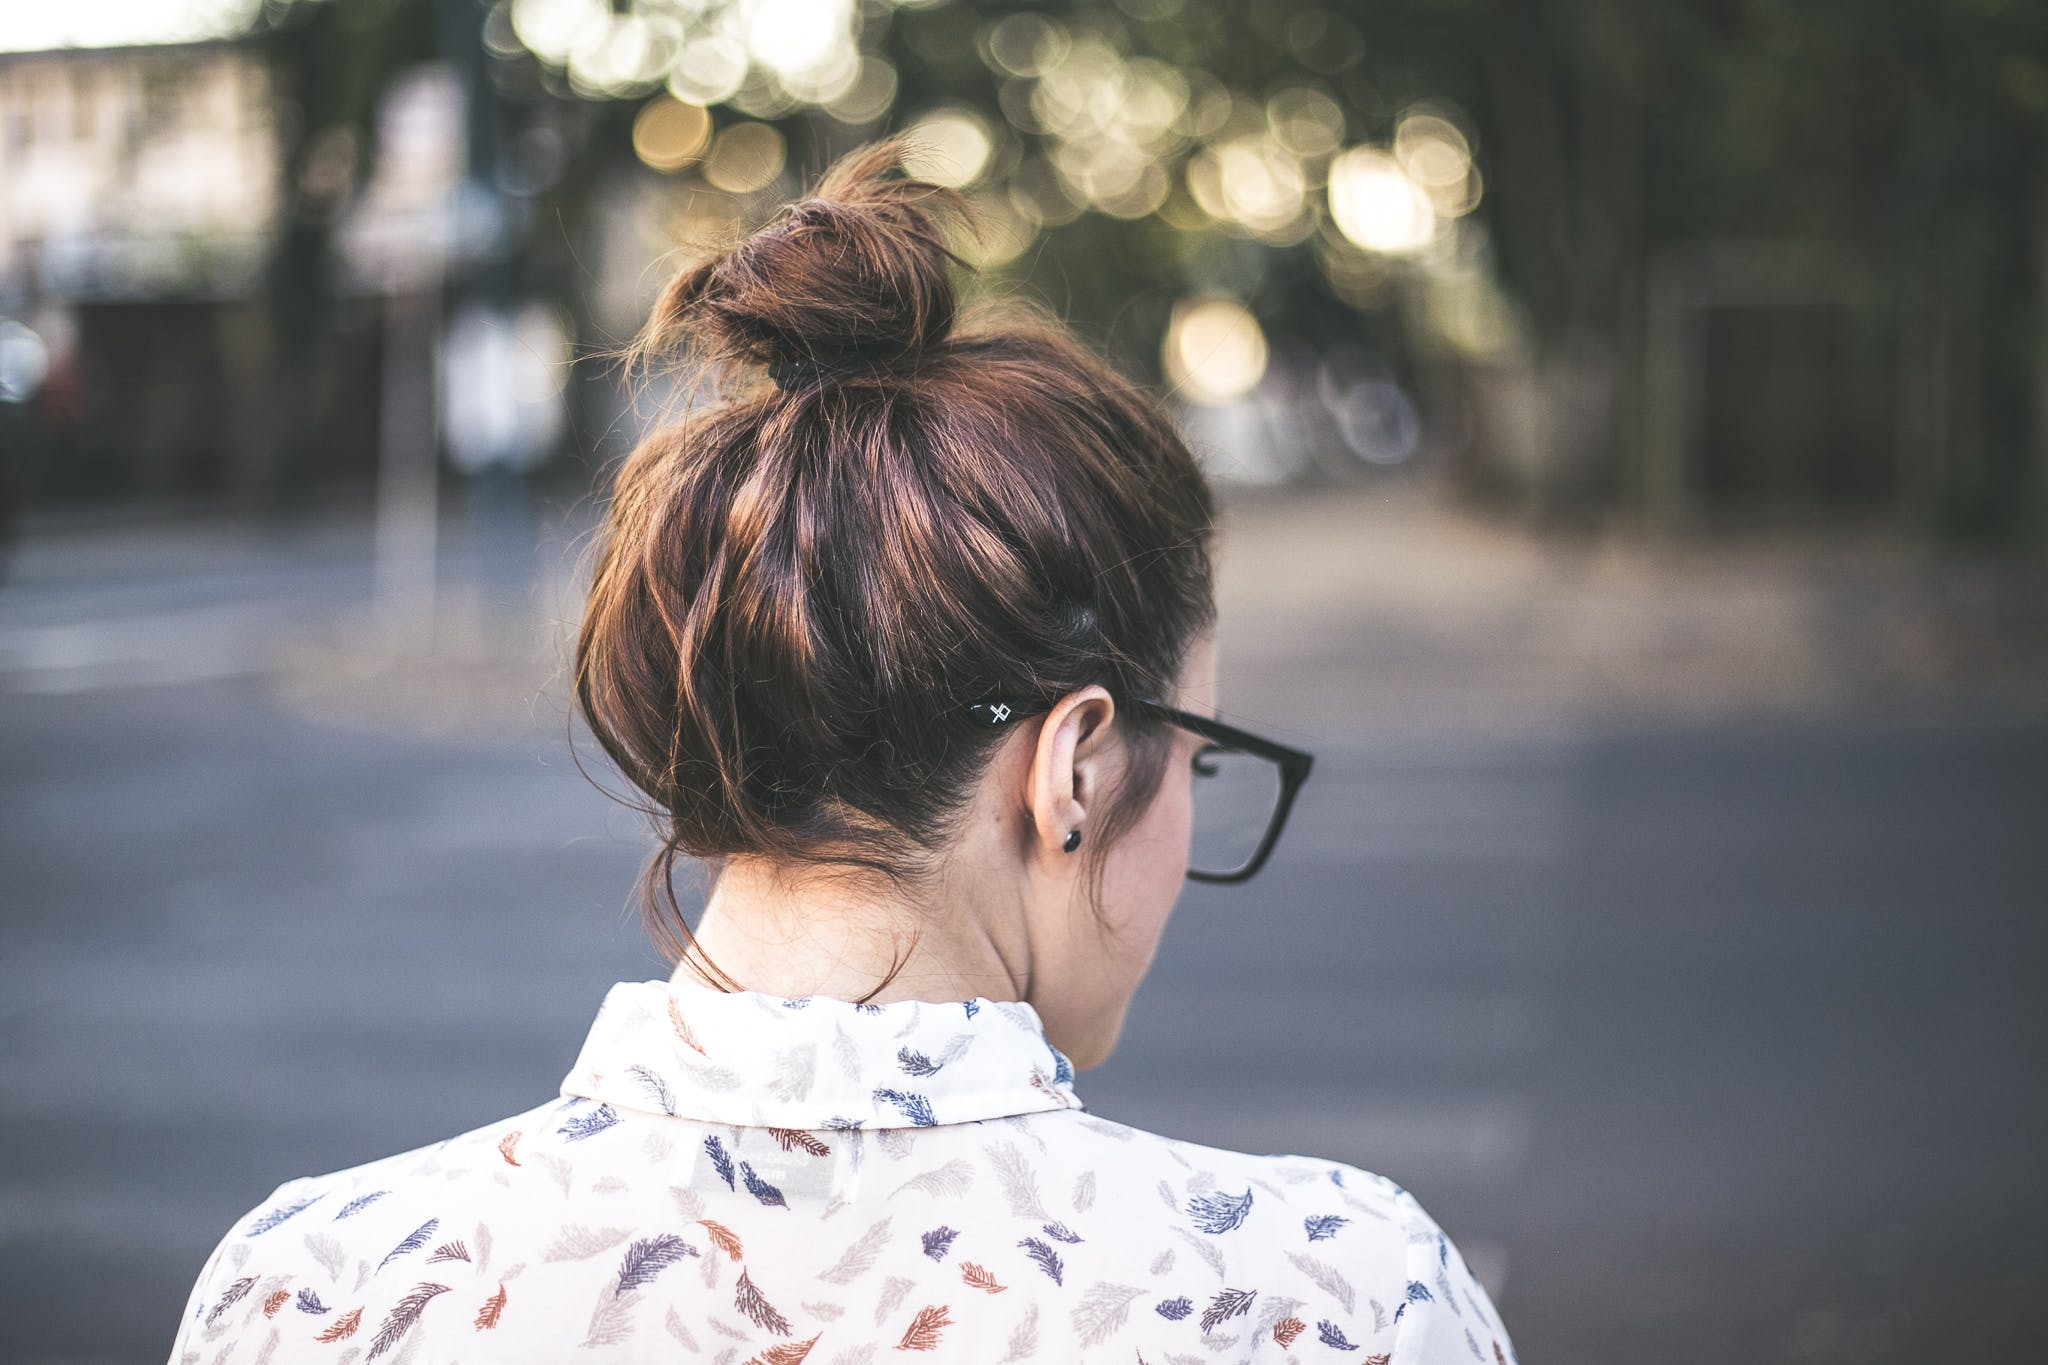 Безкоштовне стокове фото на тему «великий план, вид ззаду, волосина, Дівчина»